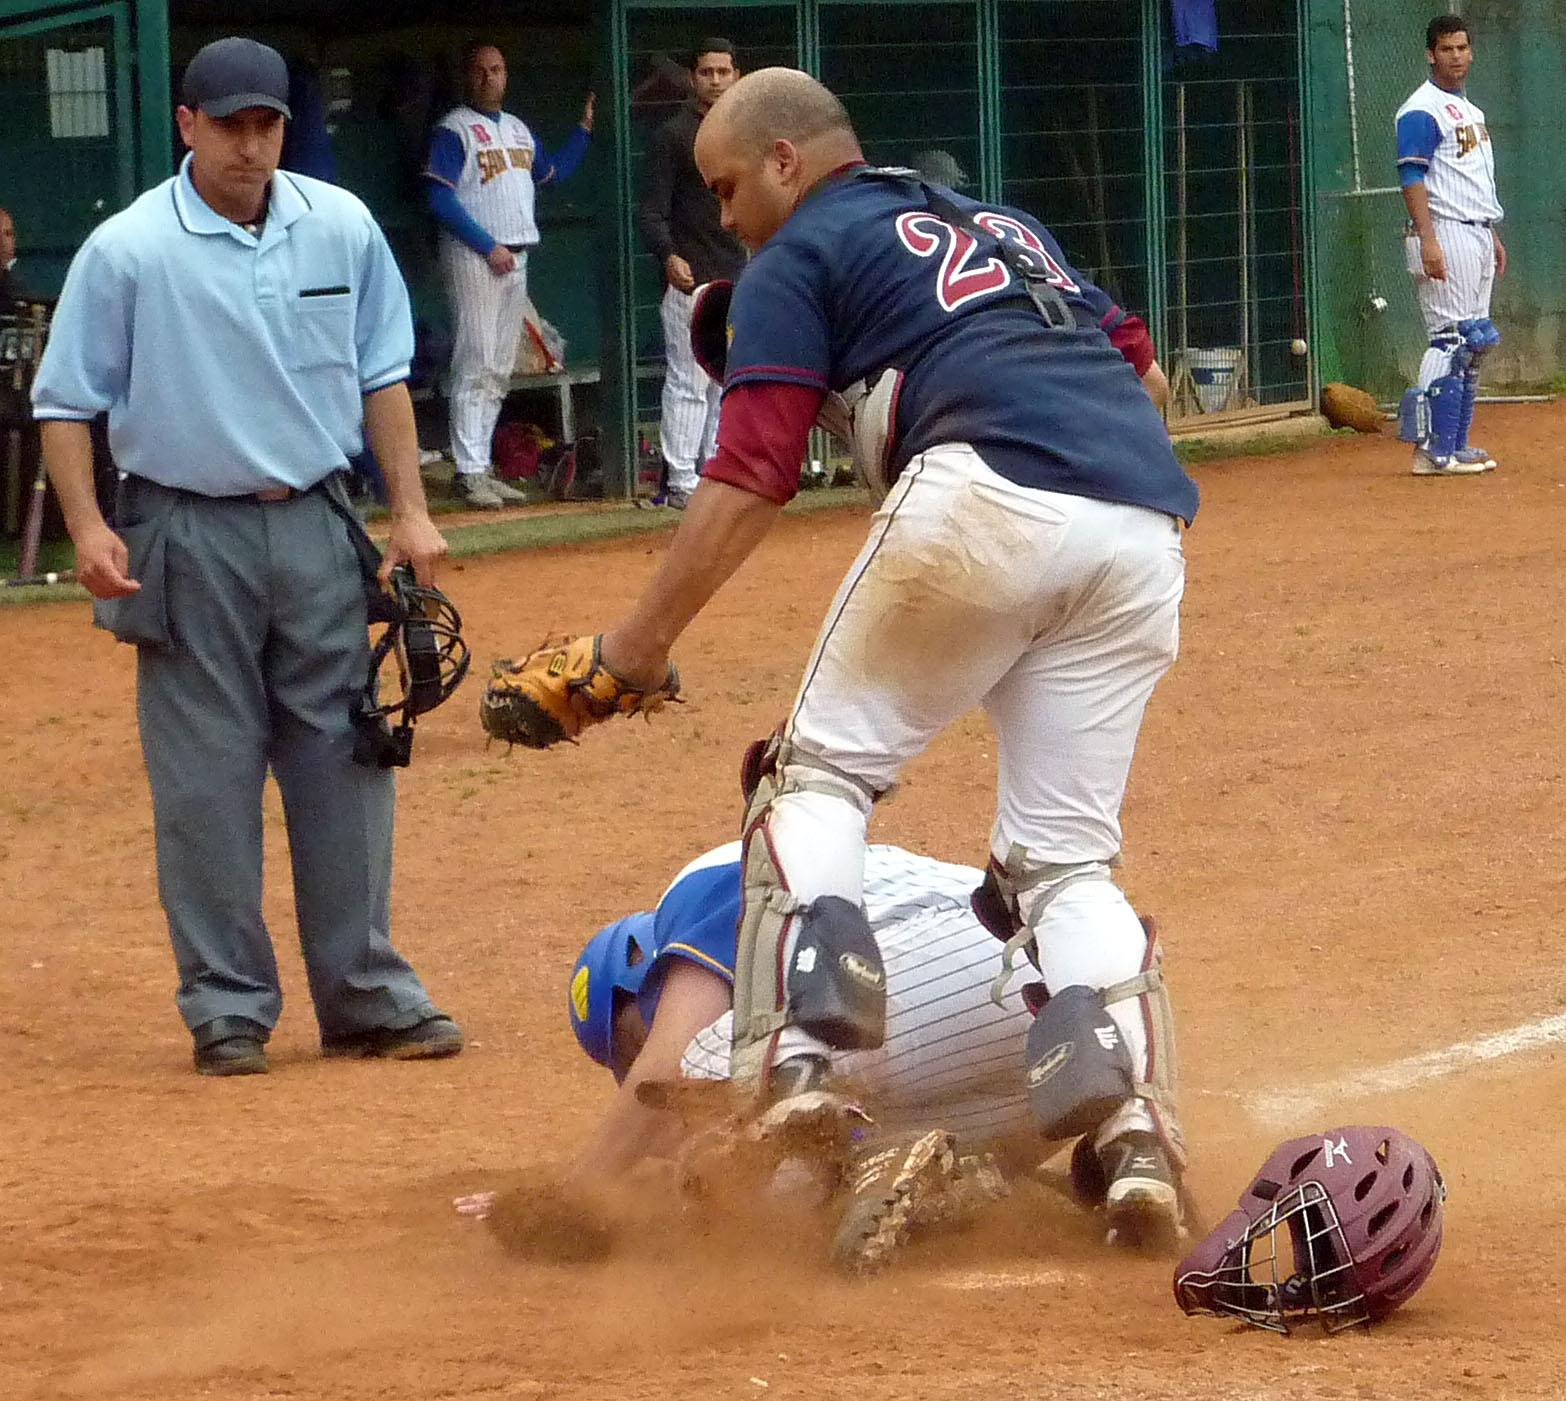 Joseba San Andres Beisbol Navarra-San Inazio (14.06.09)